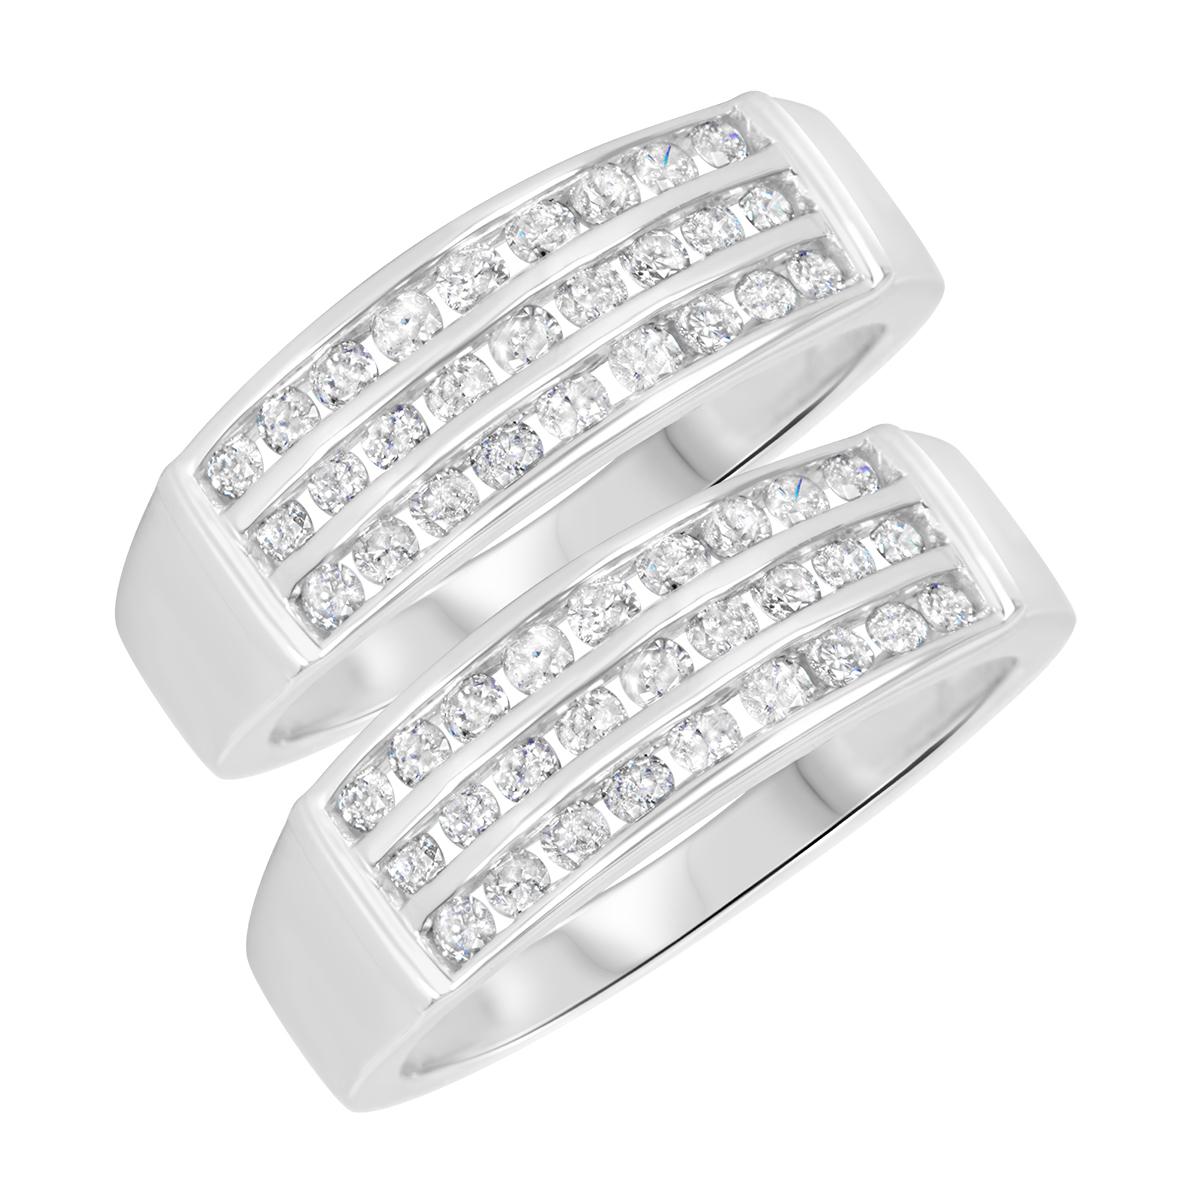 1 3/8 Carat T.W. Round Cut Mens  Same Sex Wedding Band Set 14K White Gold- Size